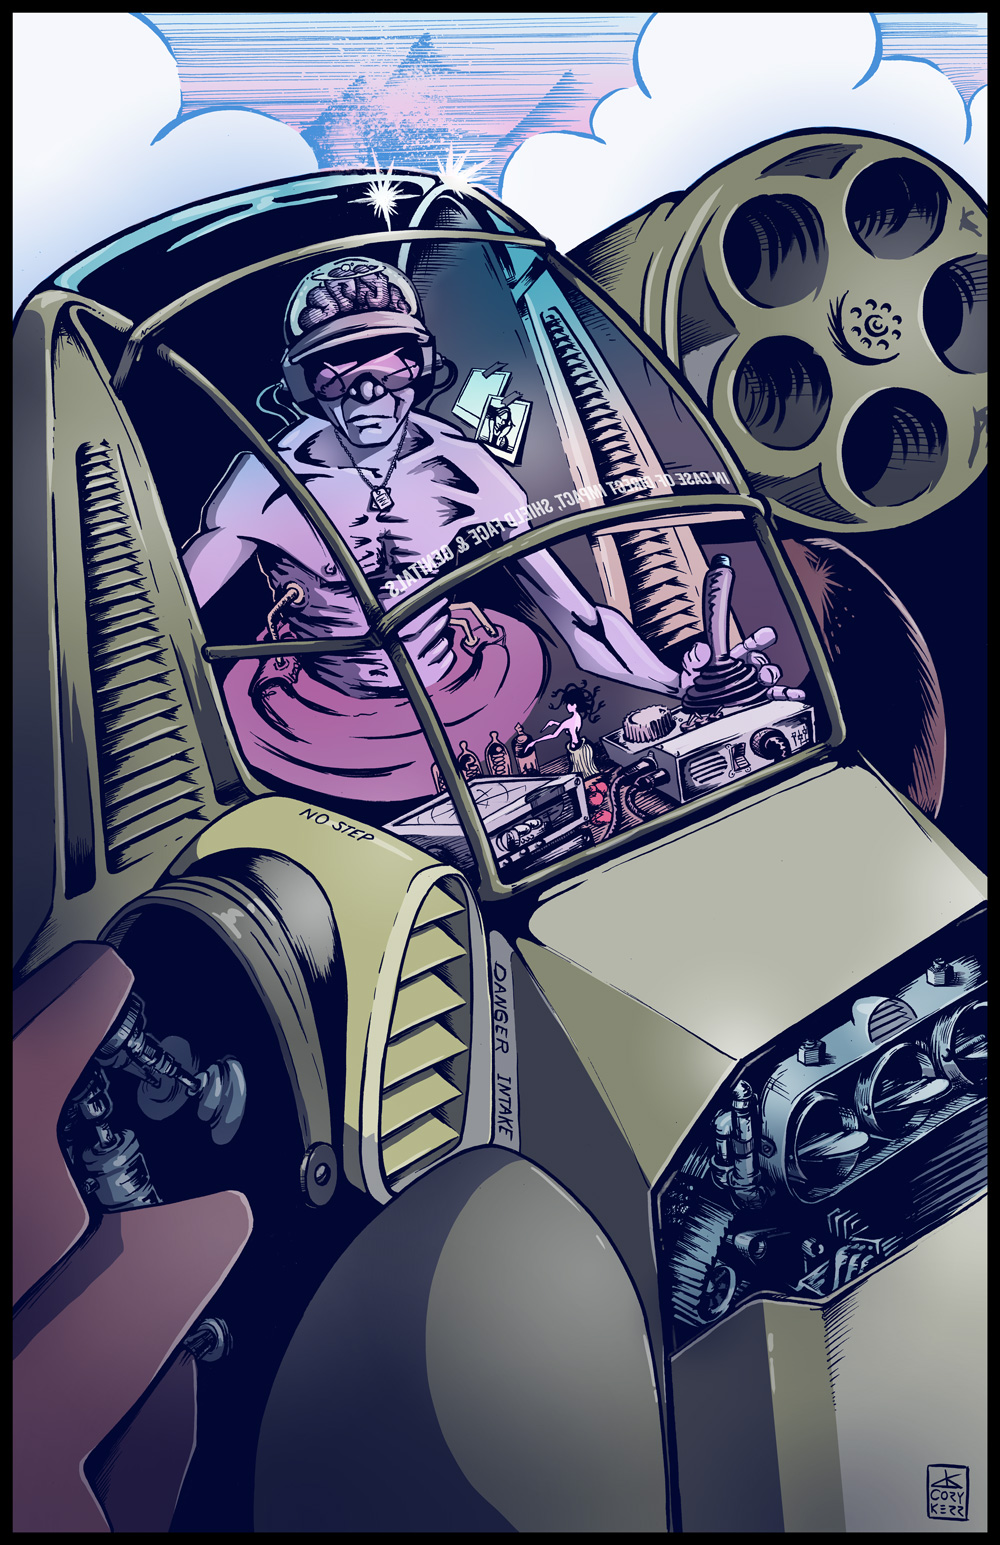 old_man_robot_cory_kerr_colors.jpg